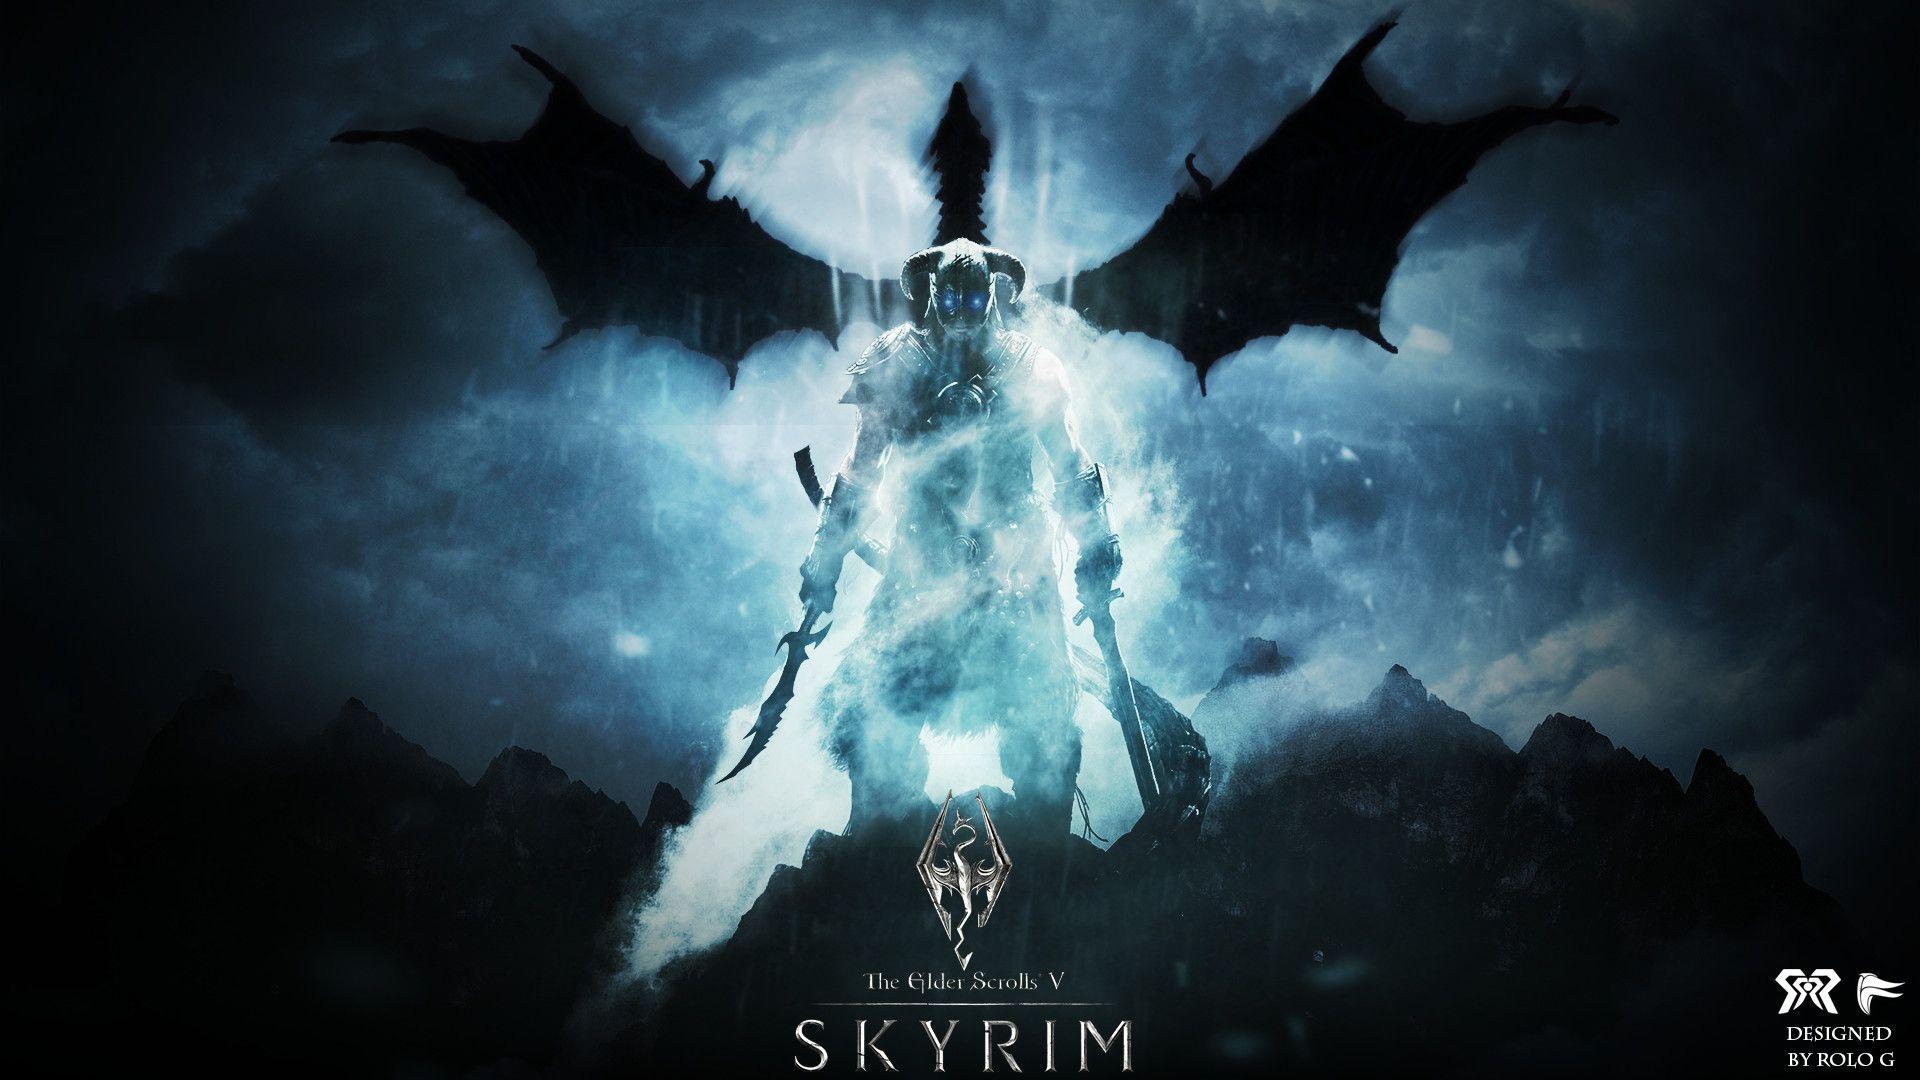 3000x1686 Skyrim Dragonborn Images Wallpaper Desktop Hd Pics Of Pc Collection